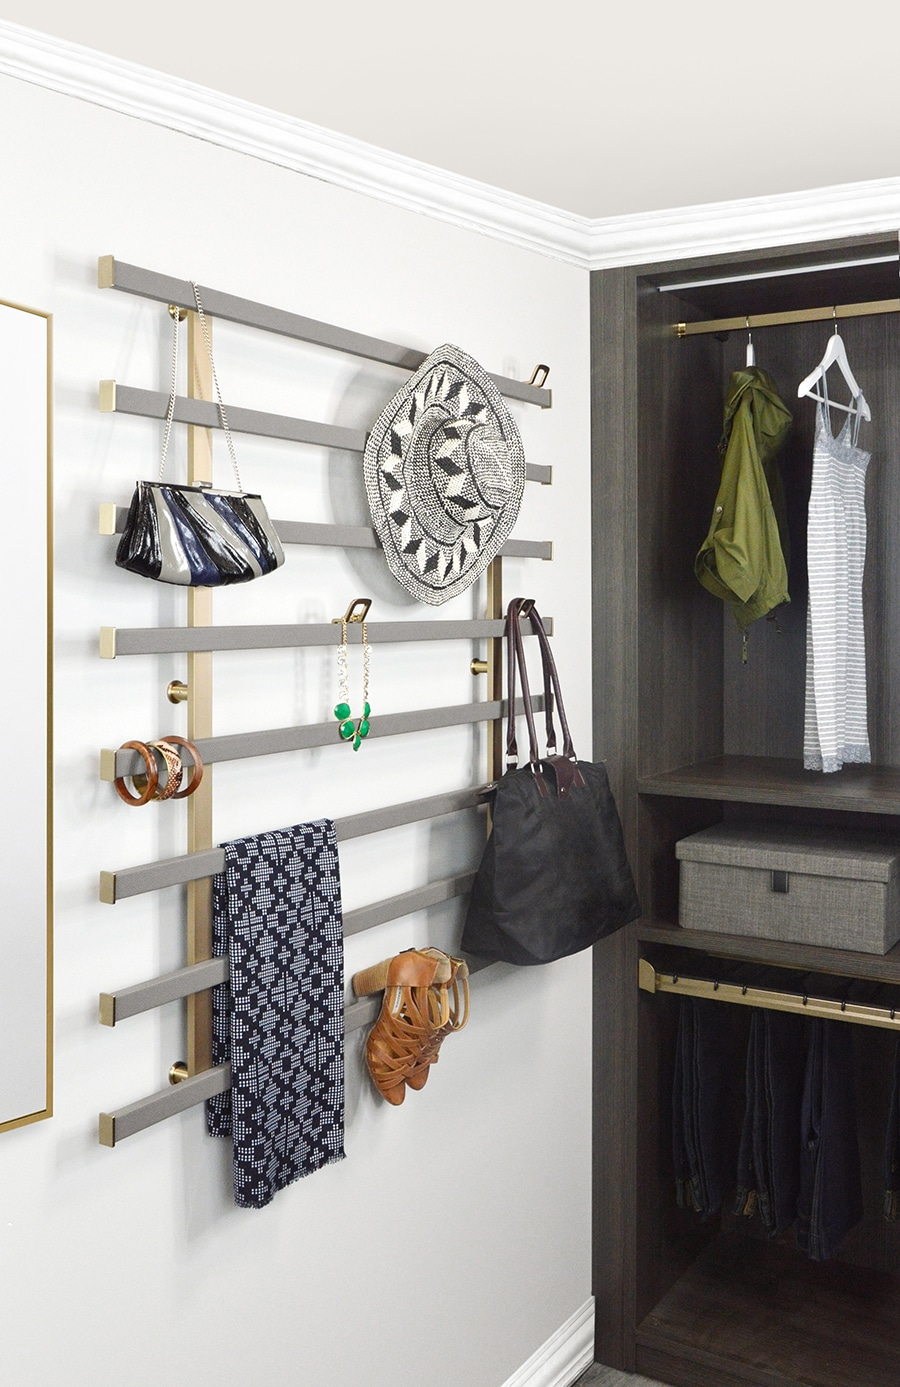 Trick 8 fashionable behind the door wall storage | Innovate Home Org #CustomStorage #OrganizationSystem #WallStorage